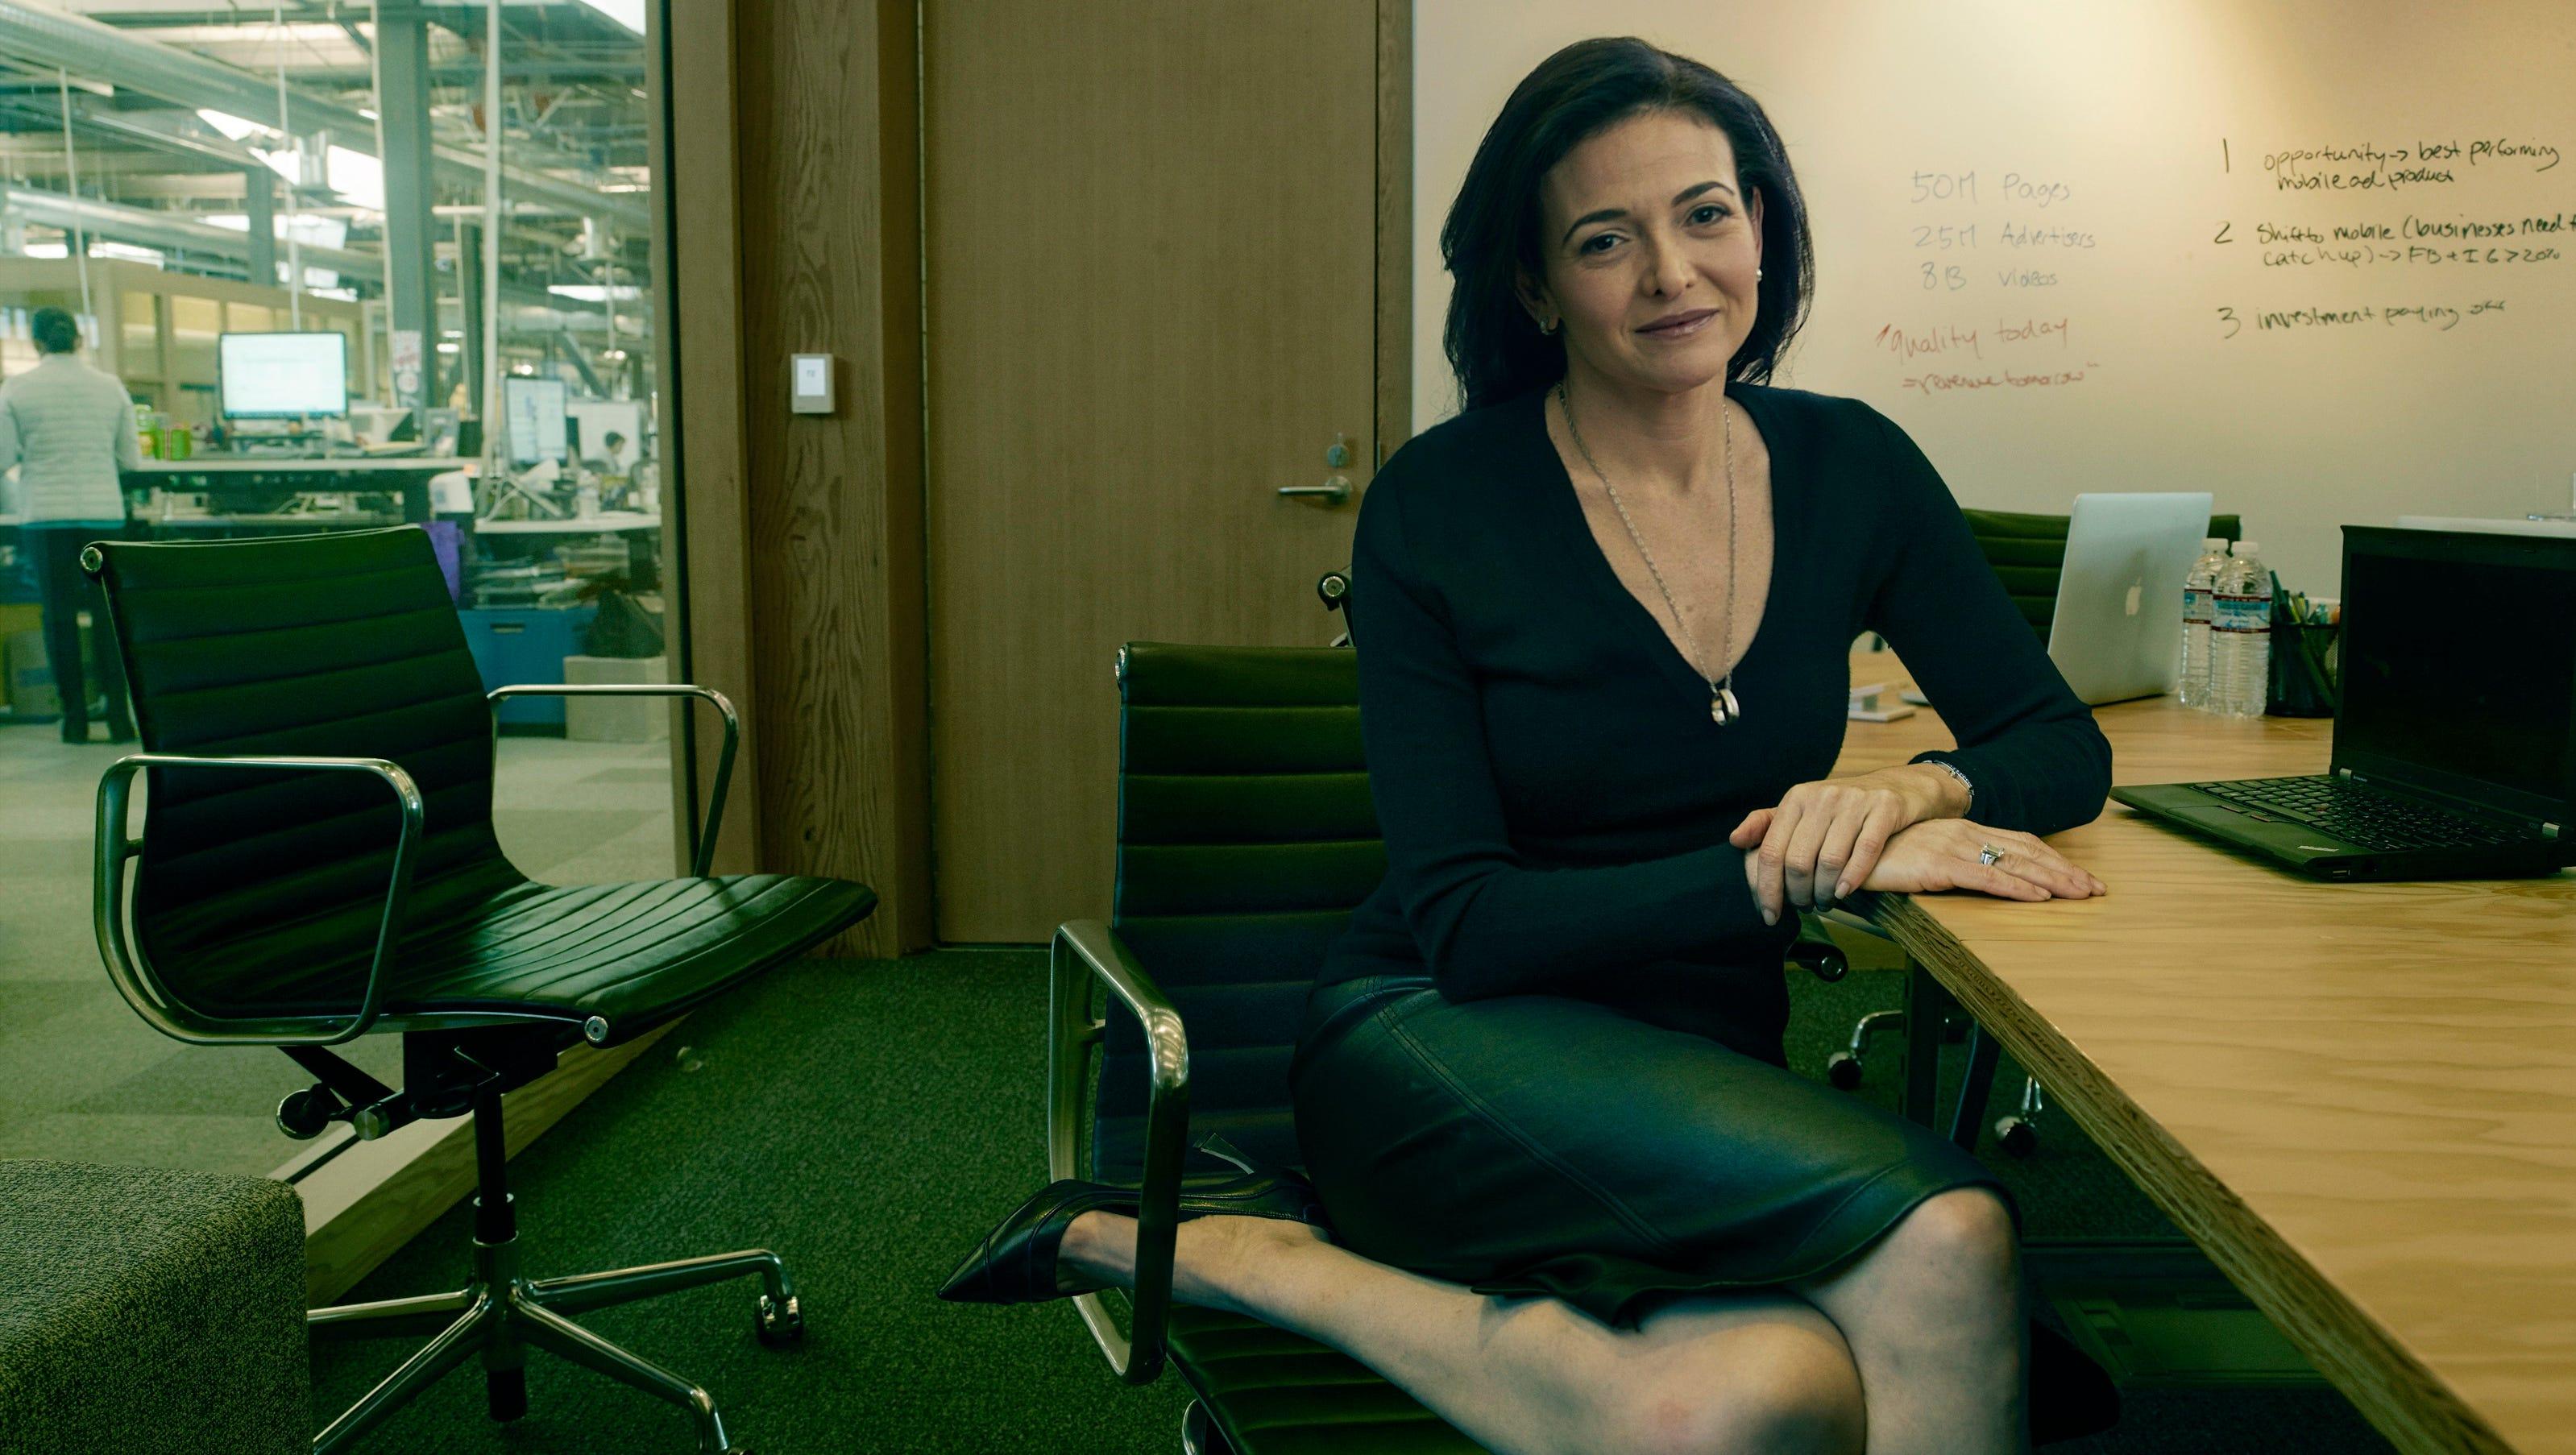 Sheryl Sandberg: Hard to lean in as single mom Sheryl Sandberg Mother S Day Post